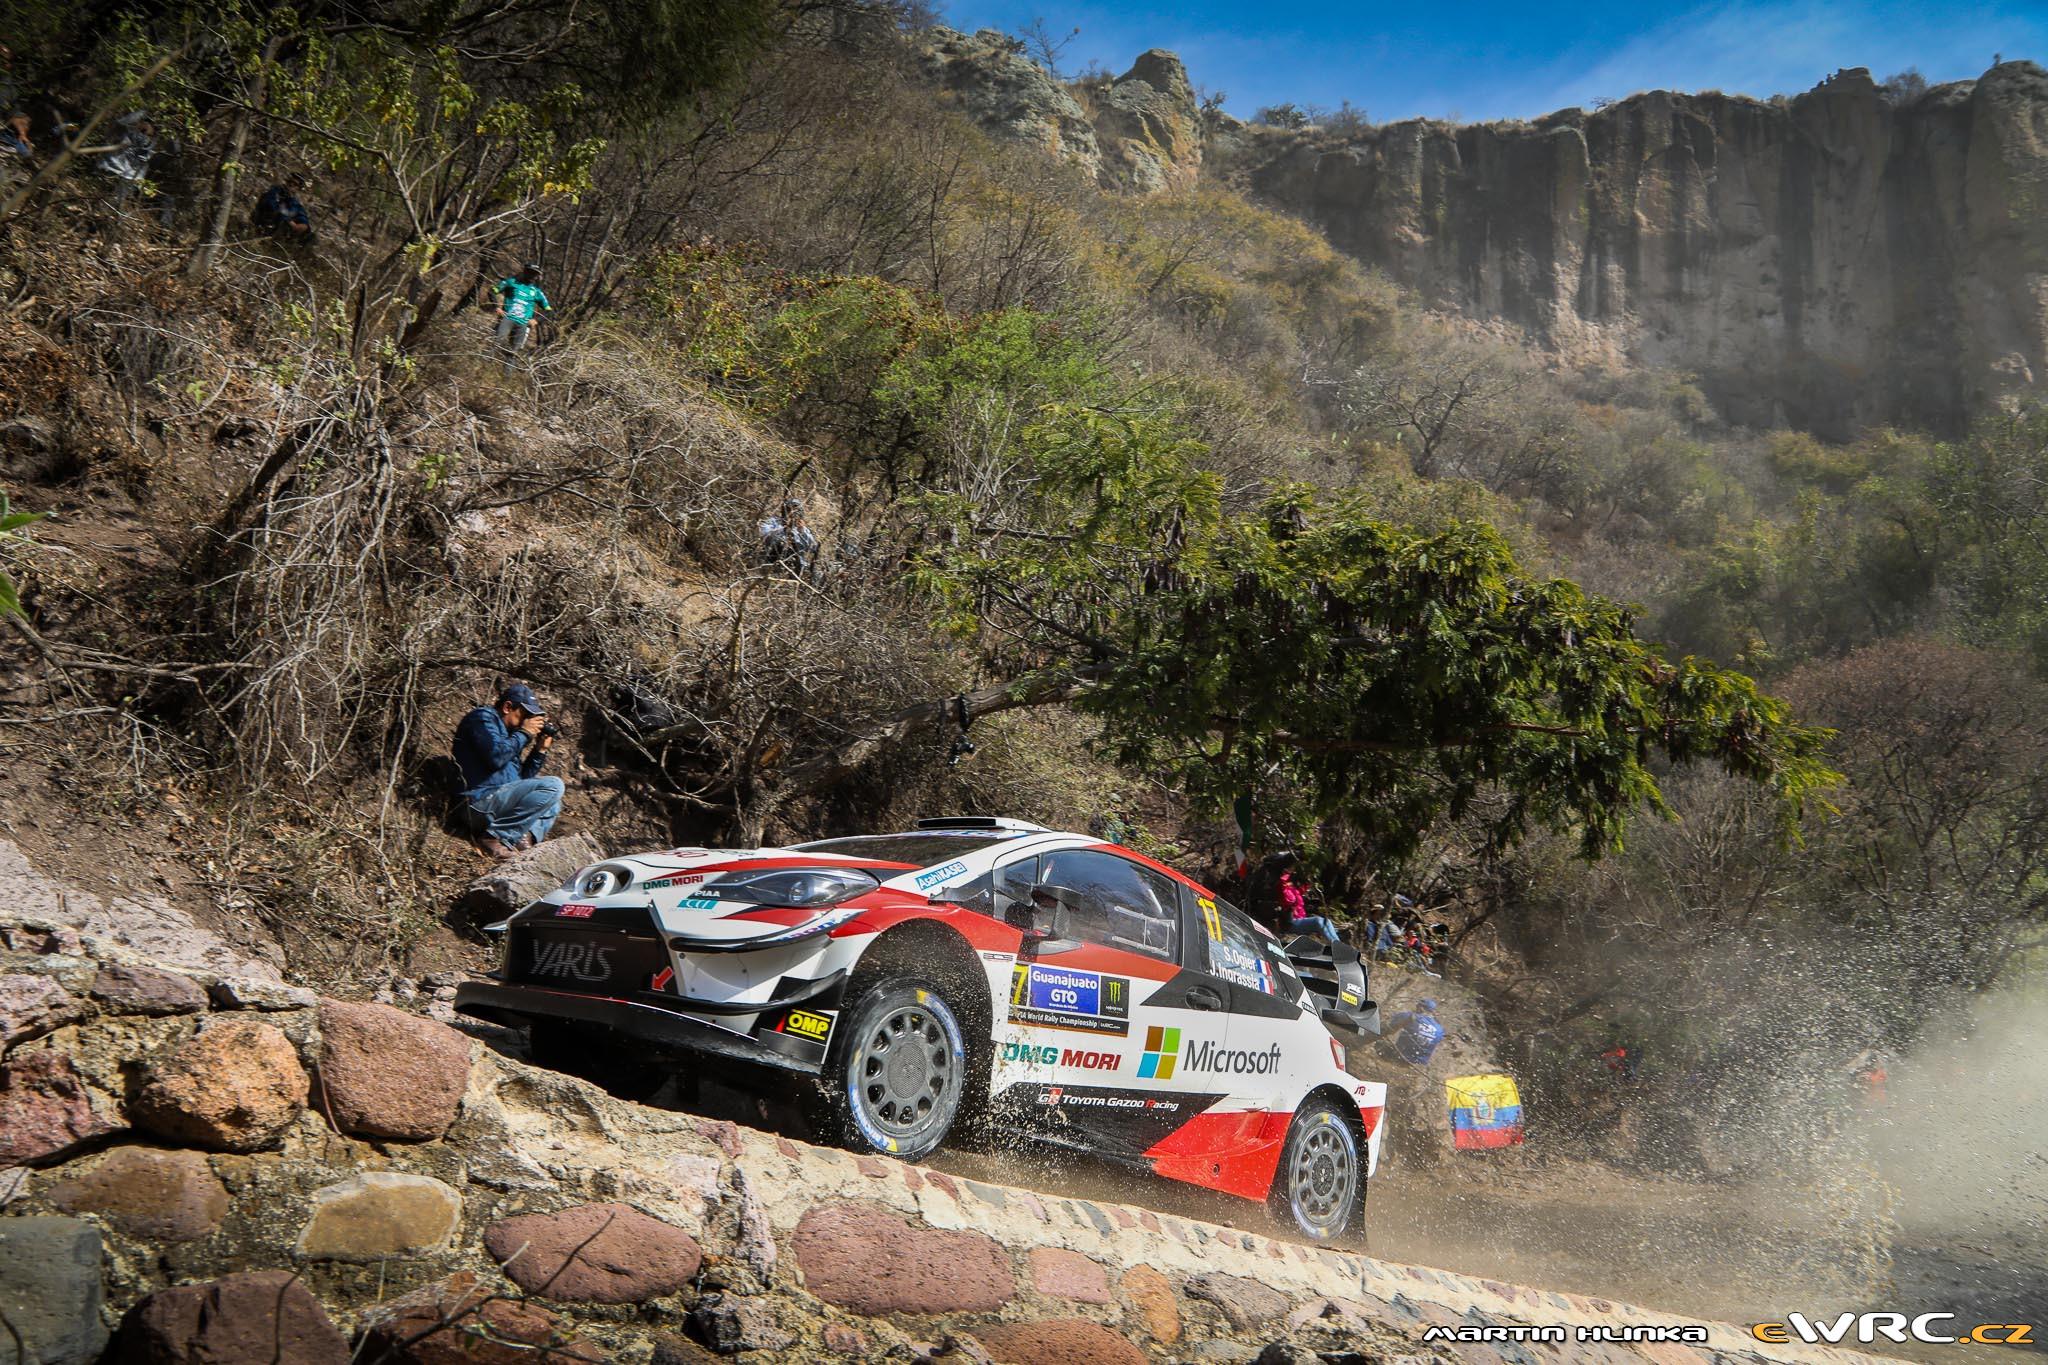 WRC: 17º Rallye Guanajuato Corona - México [12-15 Marzo] - Página 2 Mhl_9b2a0401